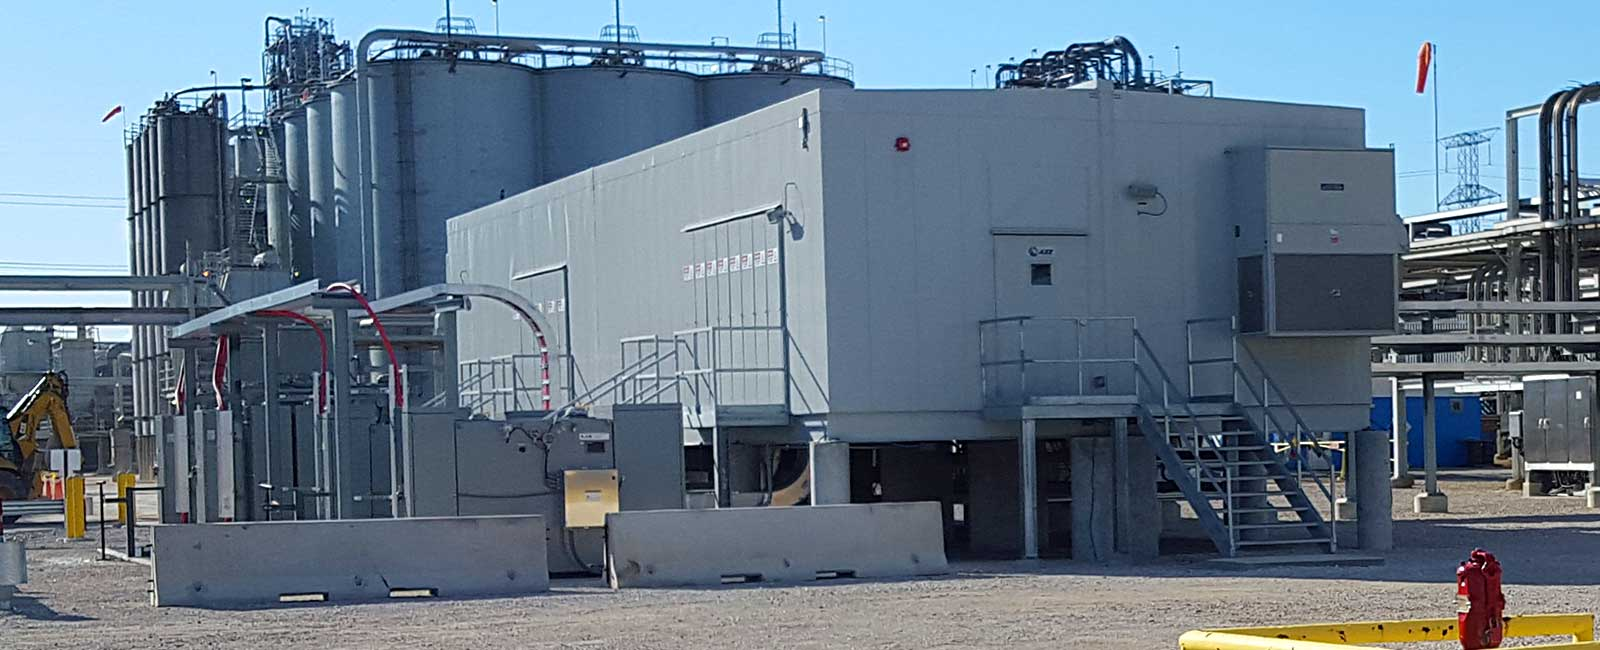 Lyondell Substation, Tri-City Electric Co., Davenport